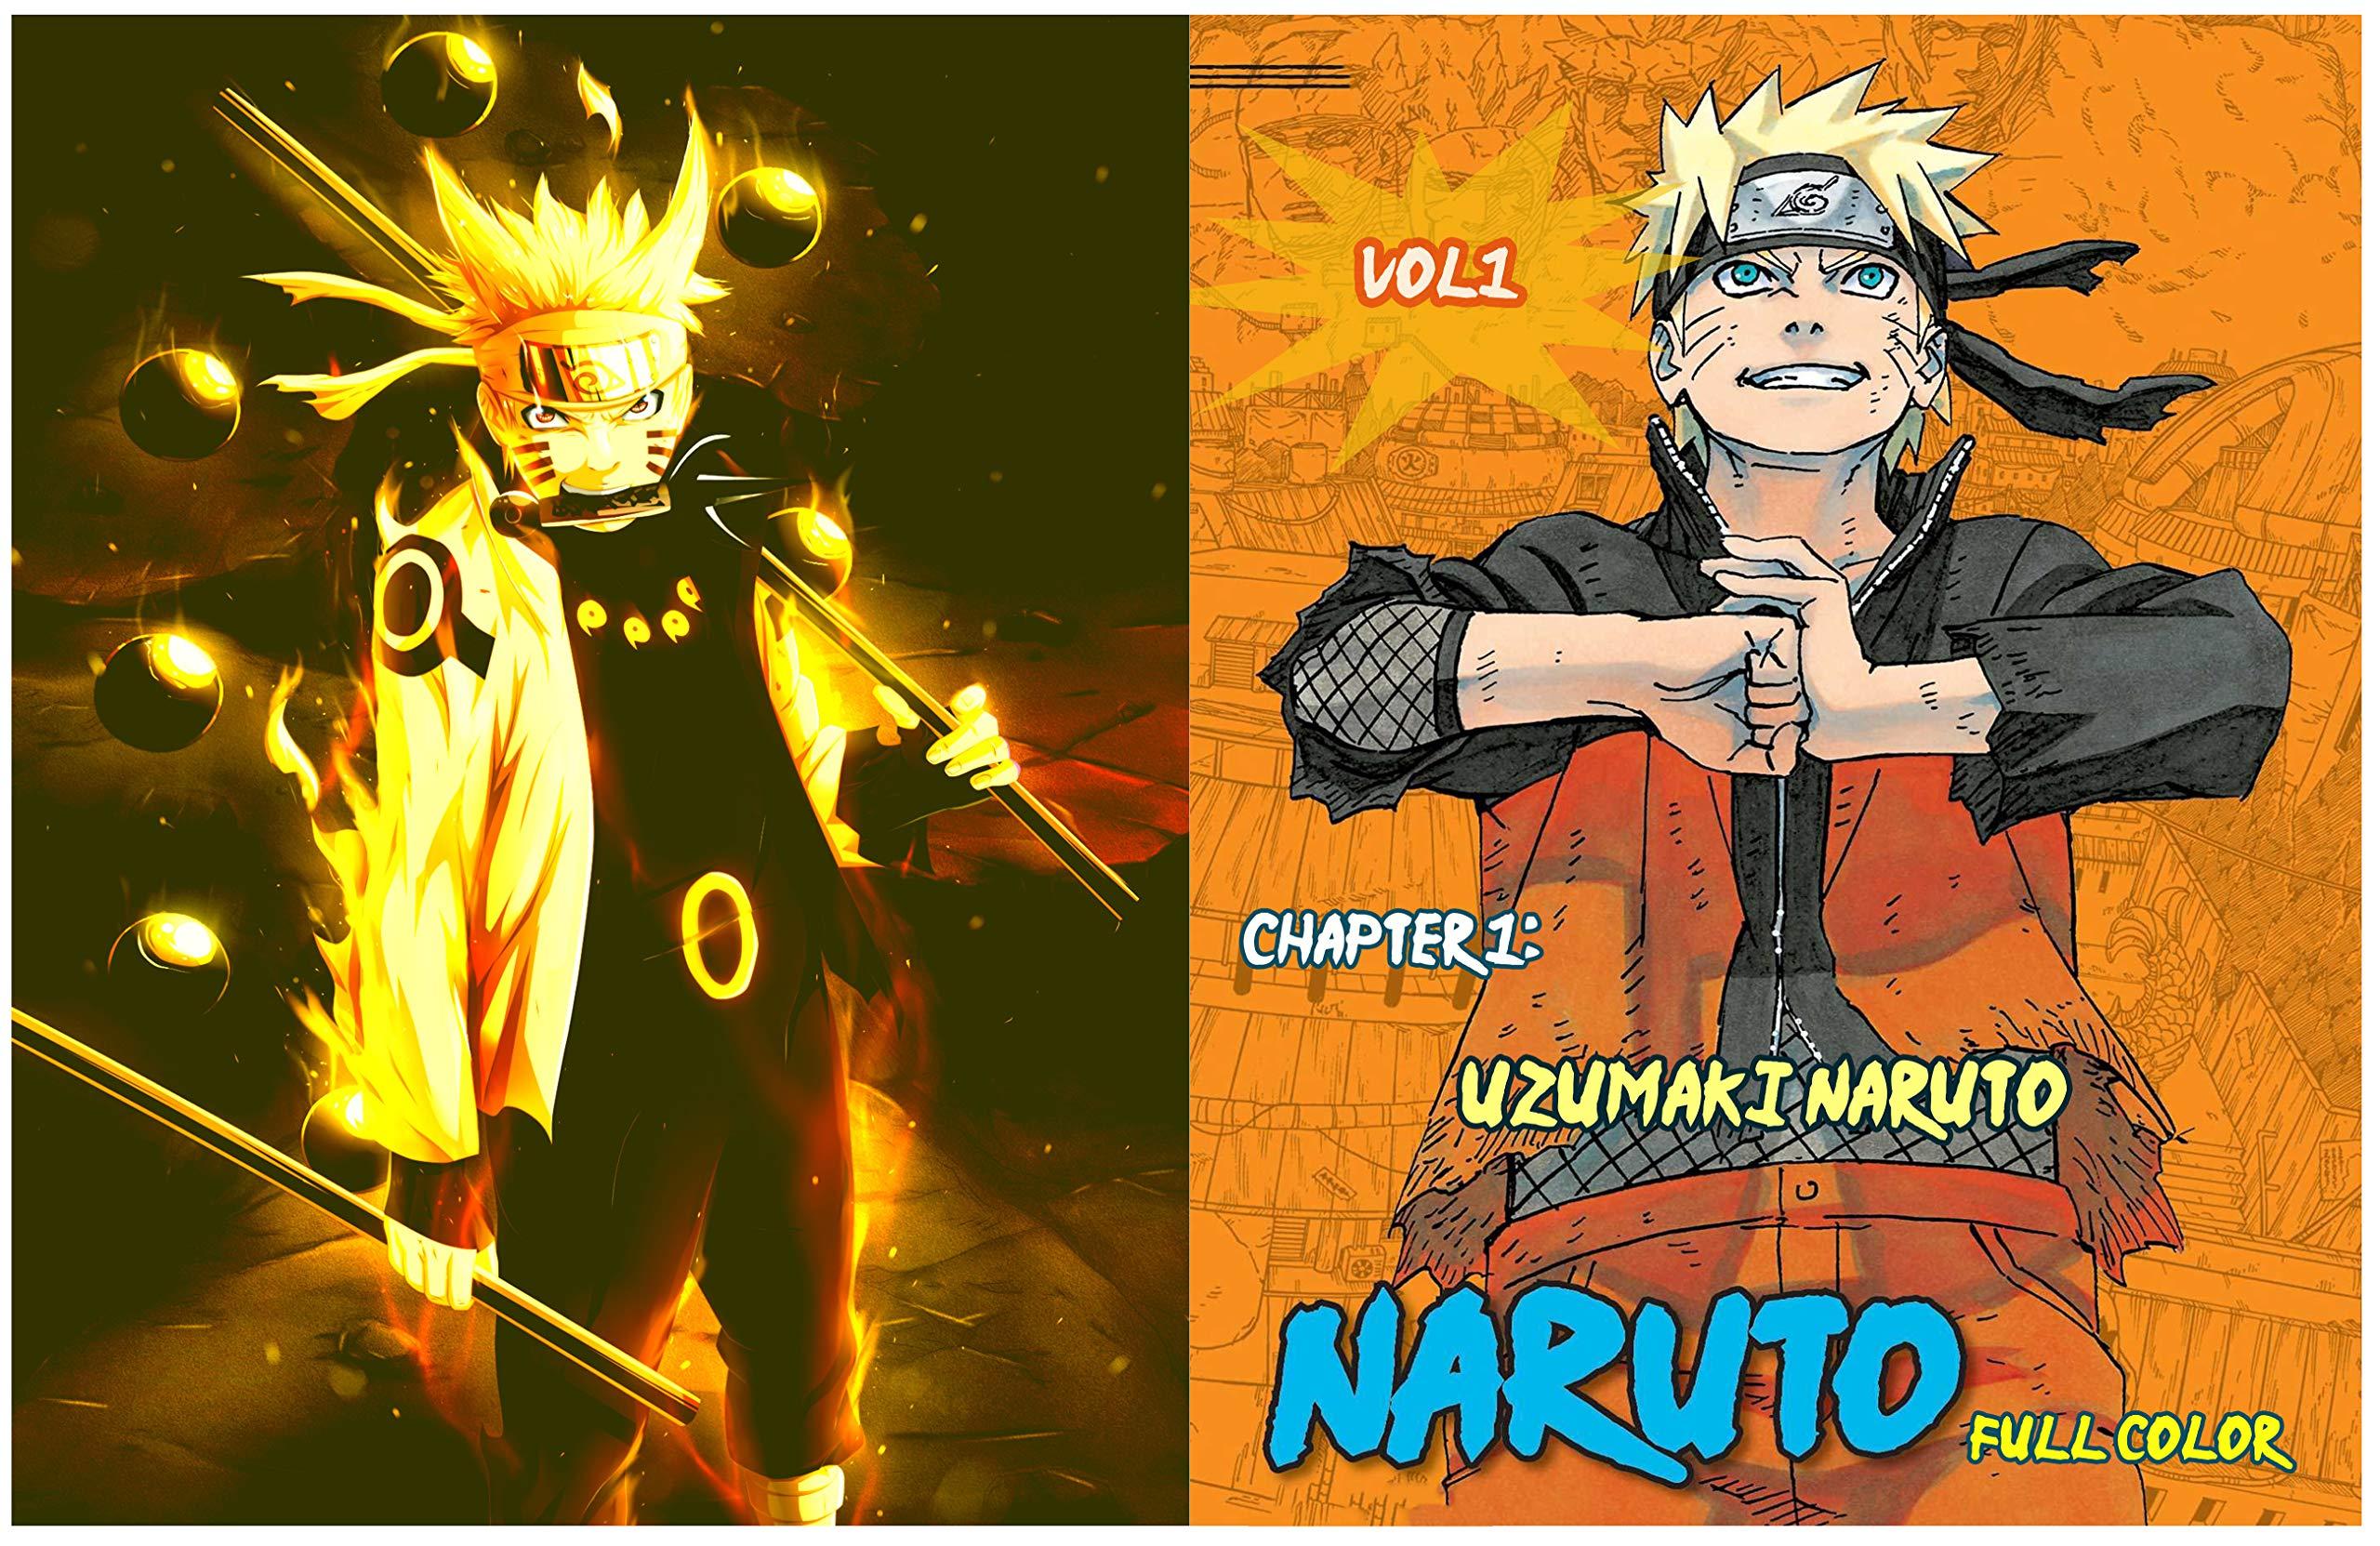 Naruto (full color): Vol1, Chapter 1: Uzumaki Naruto